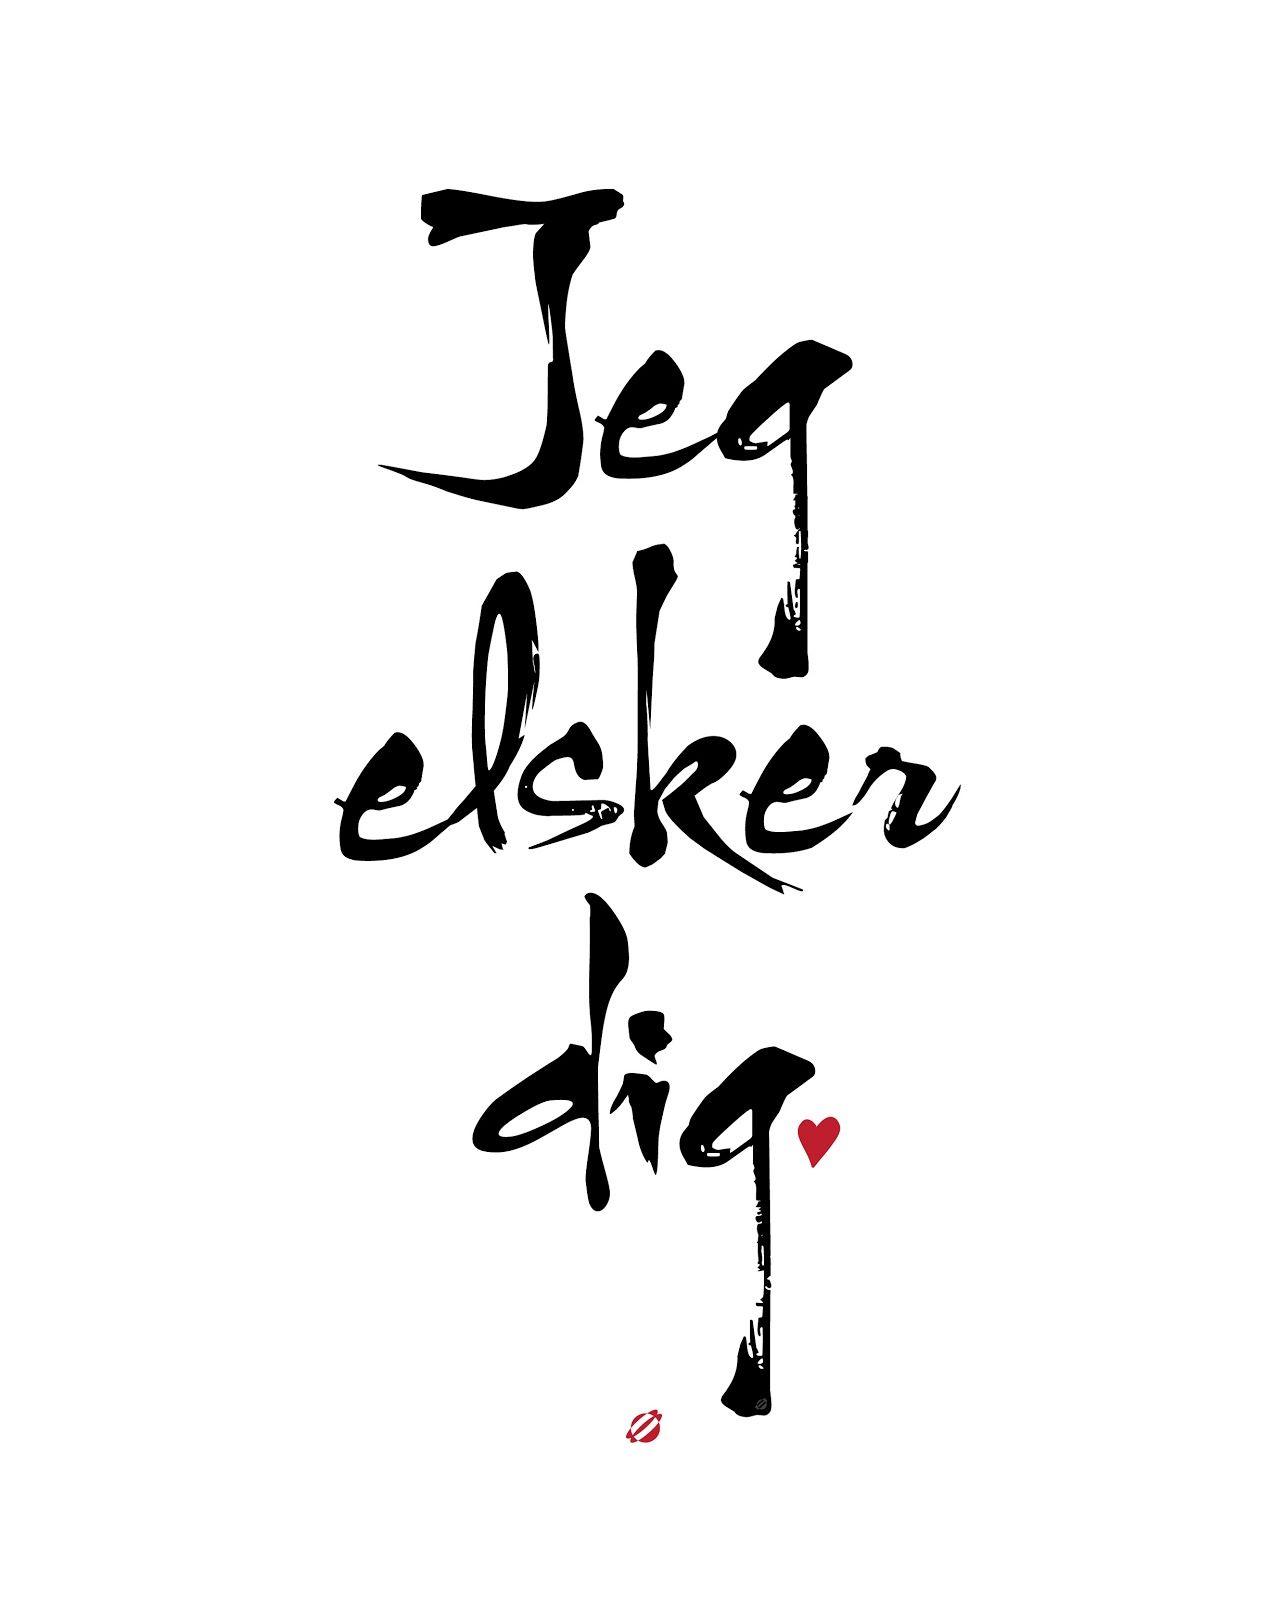 LostBumblebee ©2014 Jeg Elsker Dig- Danish I love you- Free Printable - Personal Use Only